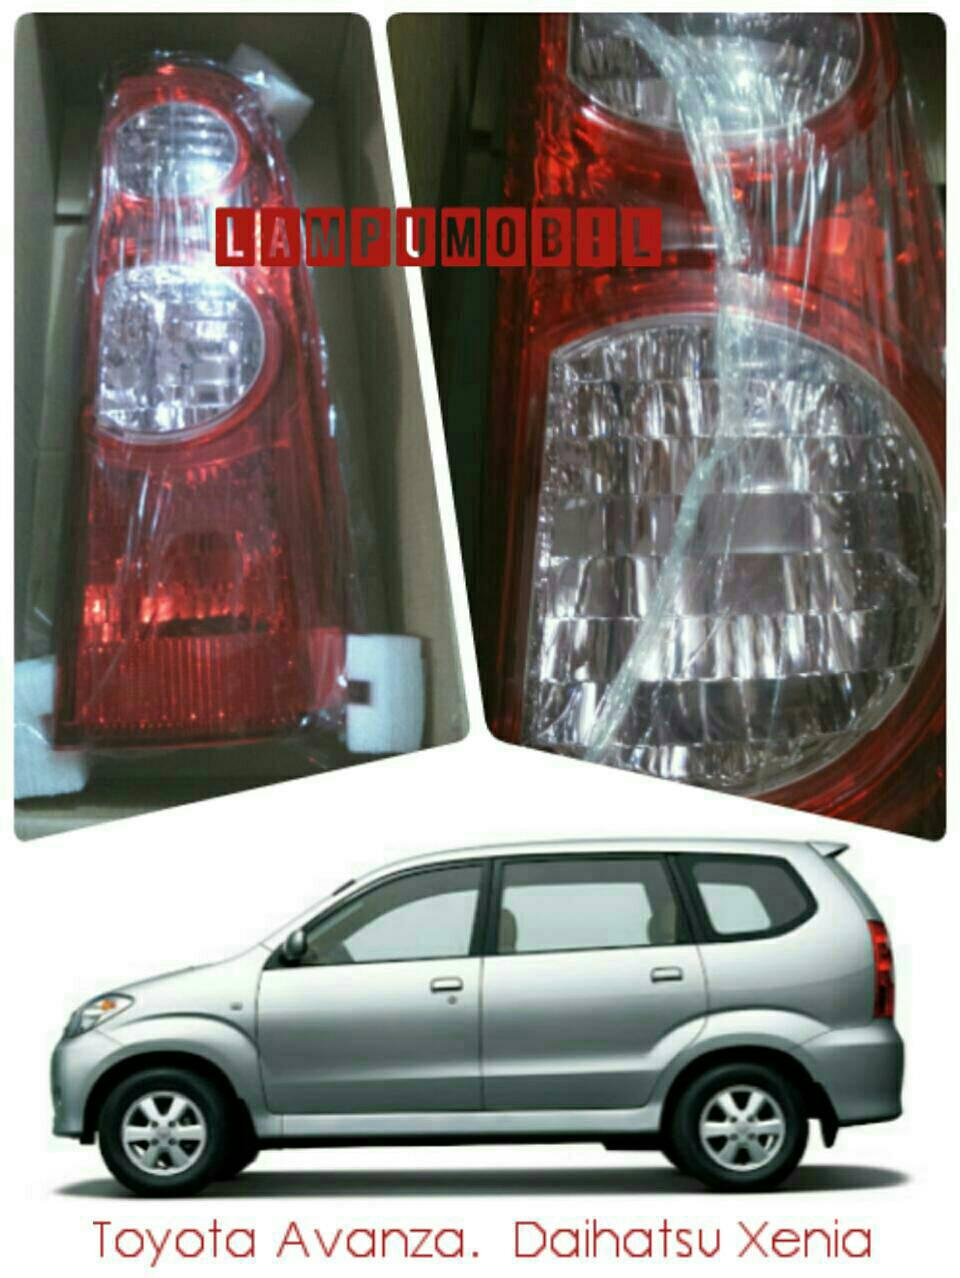 spesifikasi grand new avanza e 2015 all kijang innova 2013 koleksi ide 96 harga lampu belakang mobil toyota ...